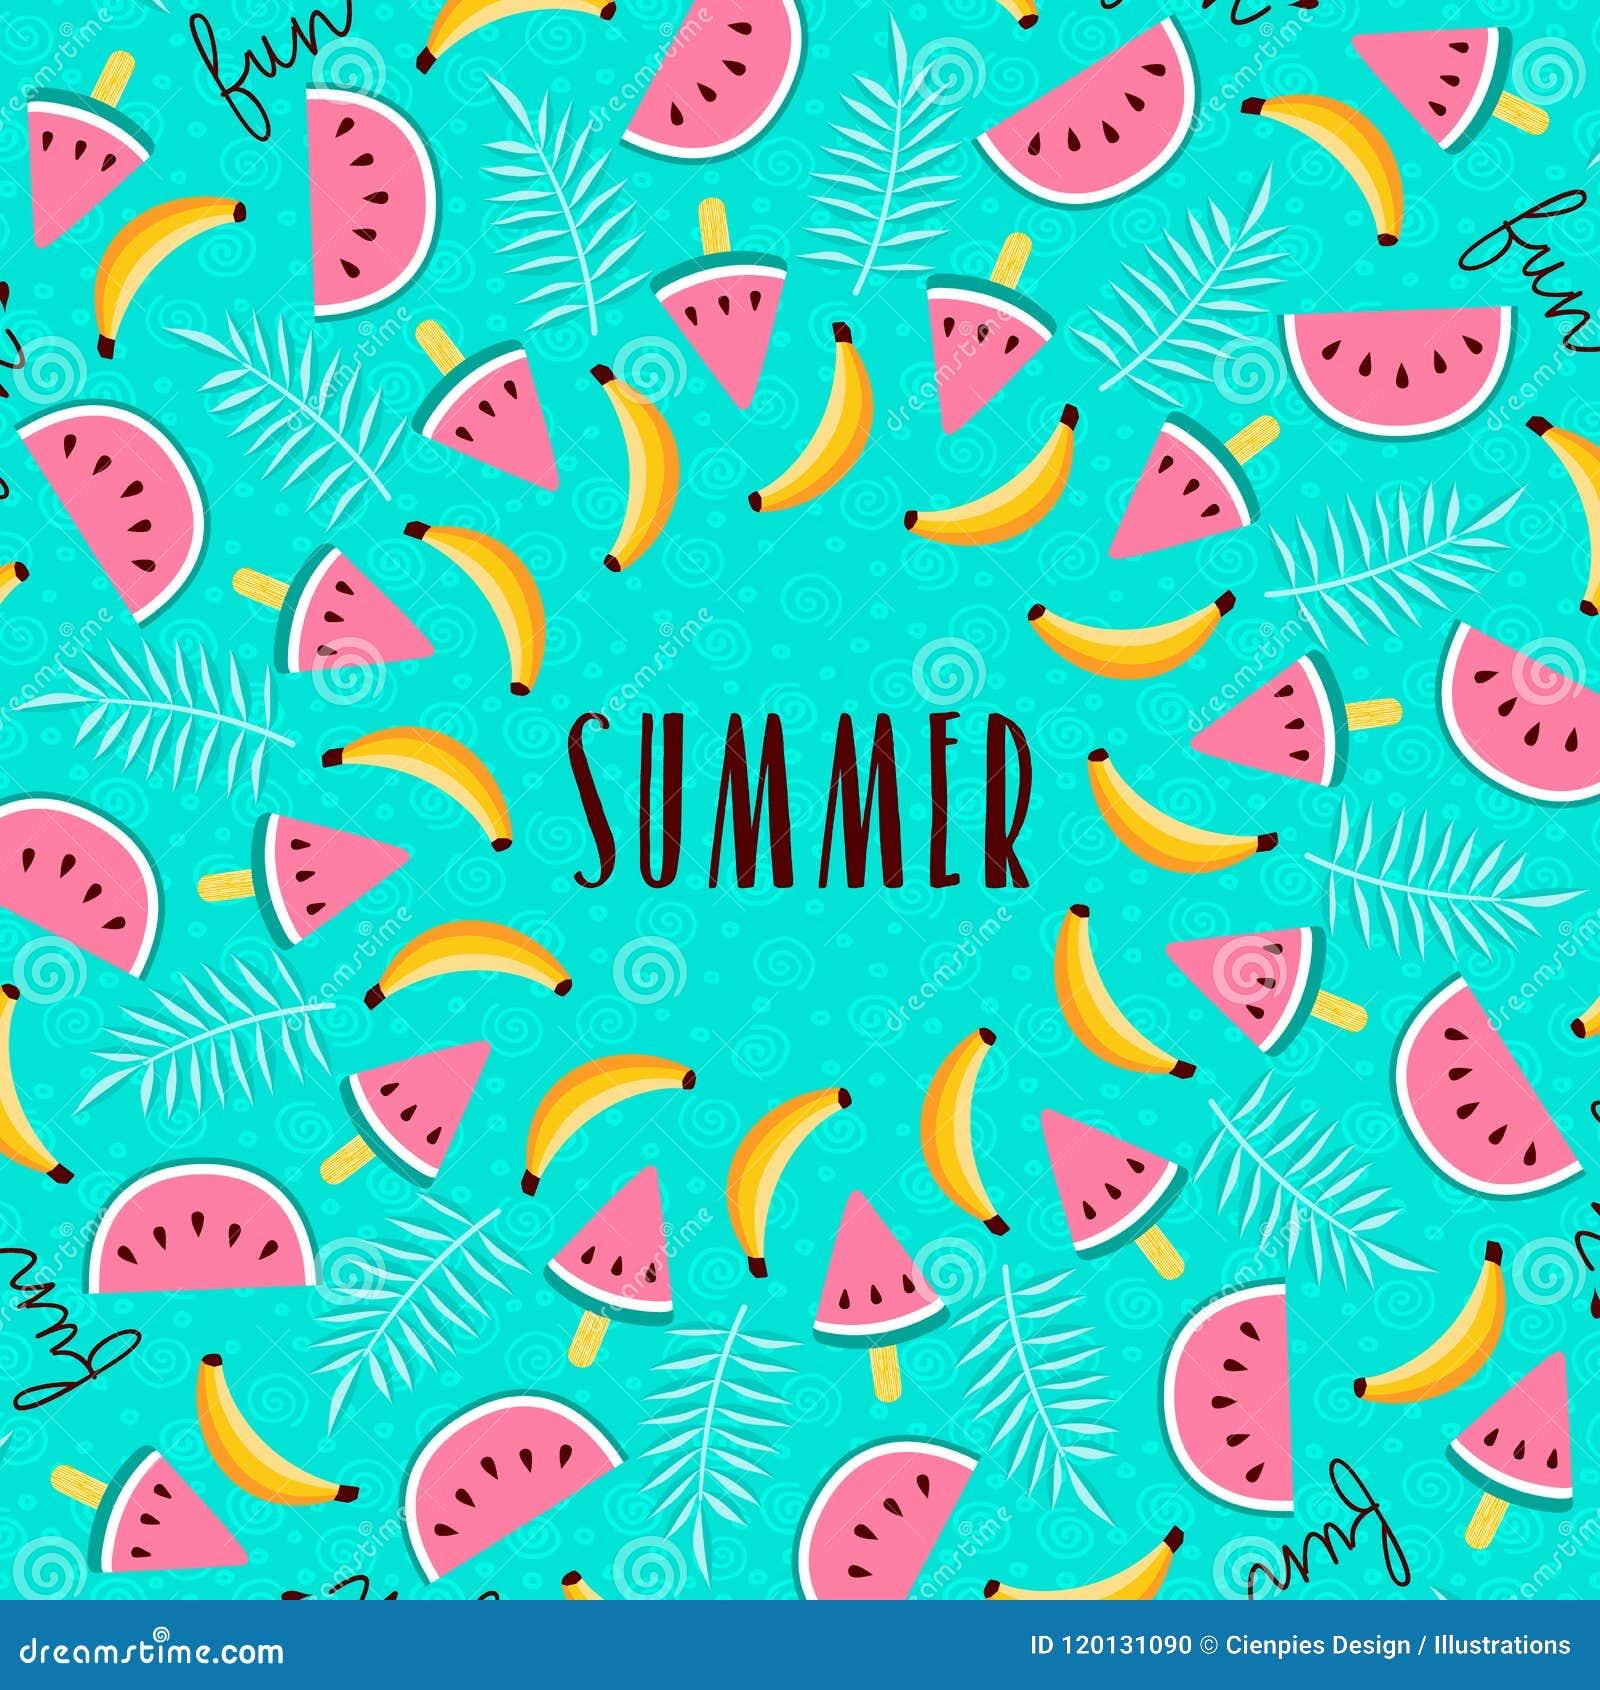 Tropical Summer Season Fruit Greeting Card